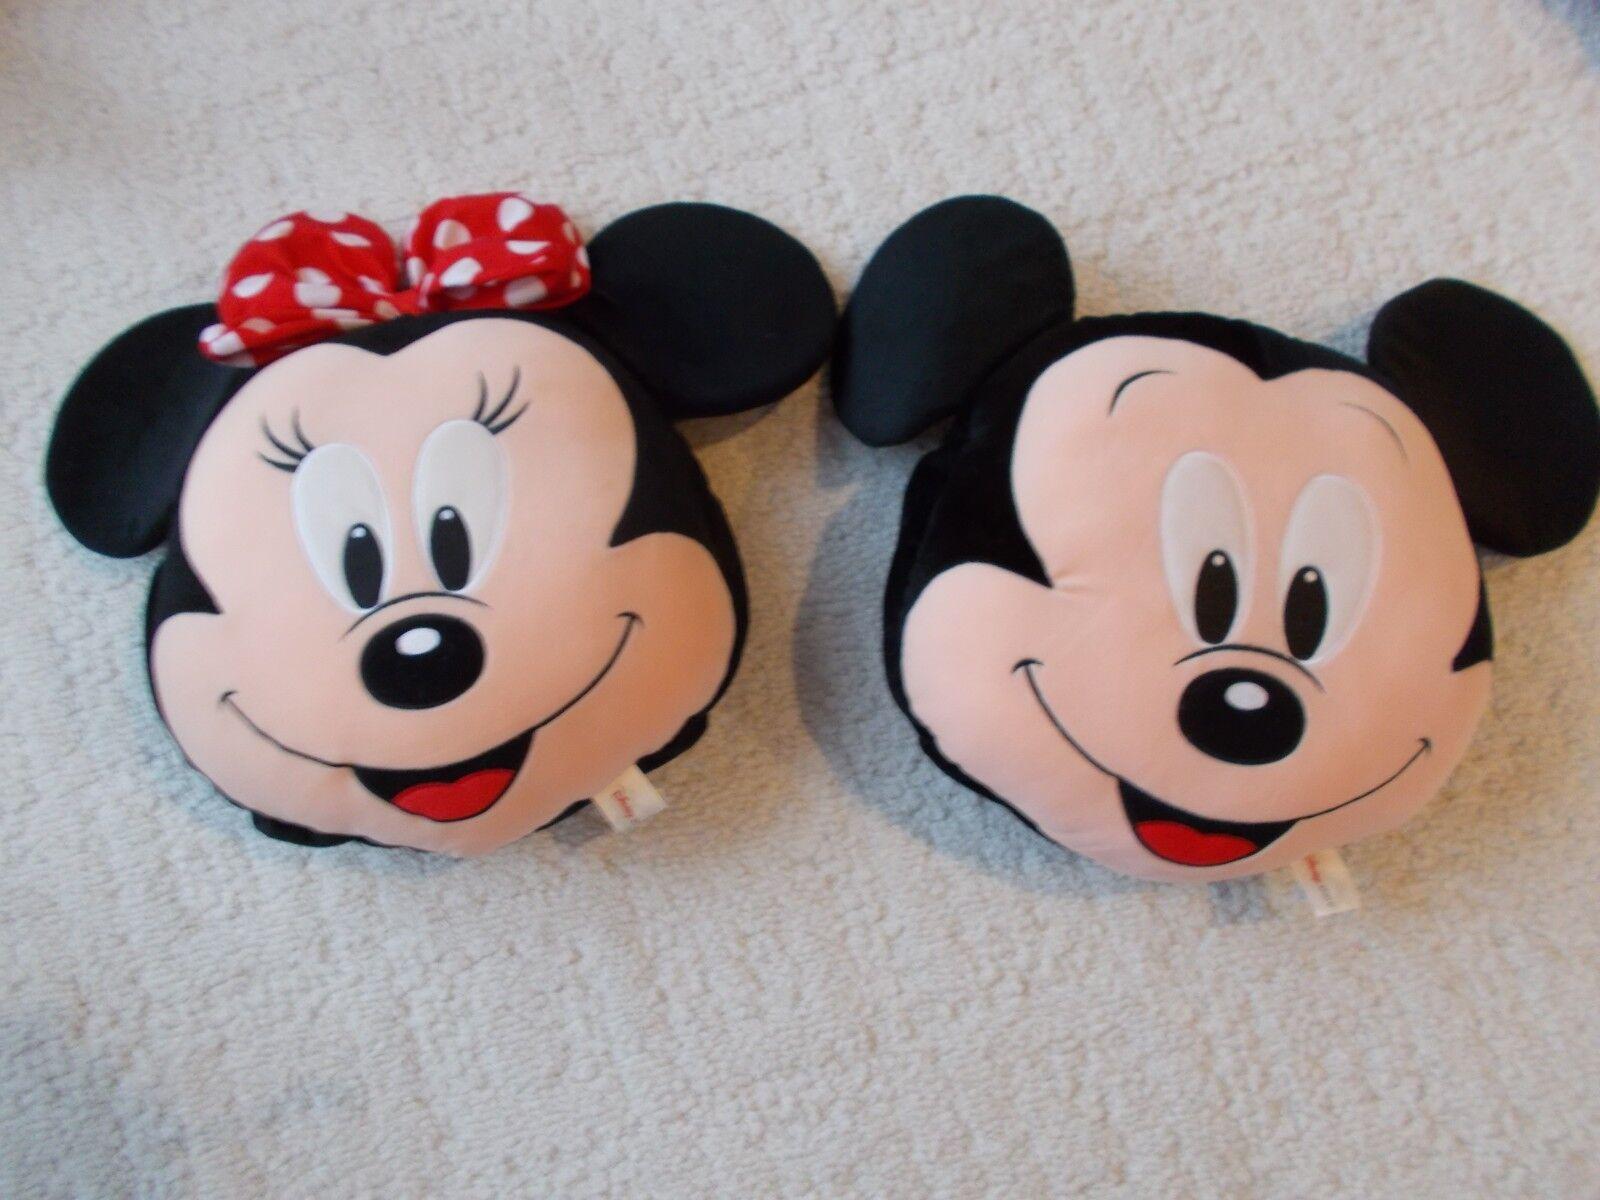 "2 Disney's MICKEY & MINNIE MOUSE HEAD THROW PILLOWS 22"" X 18"